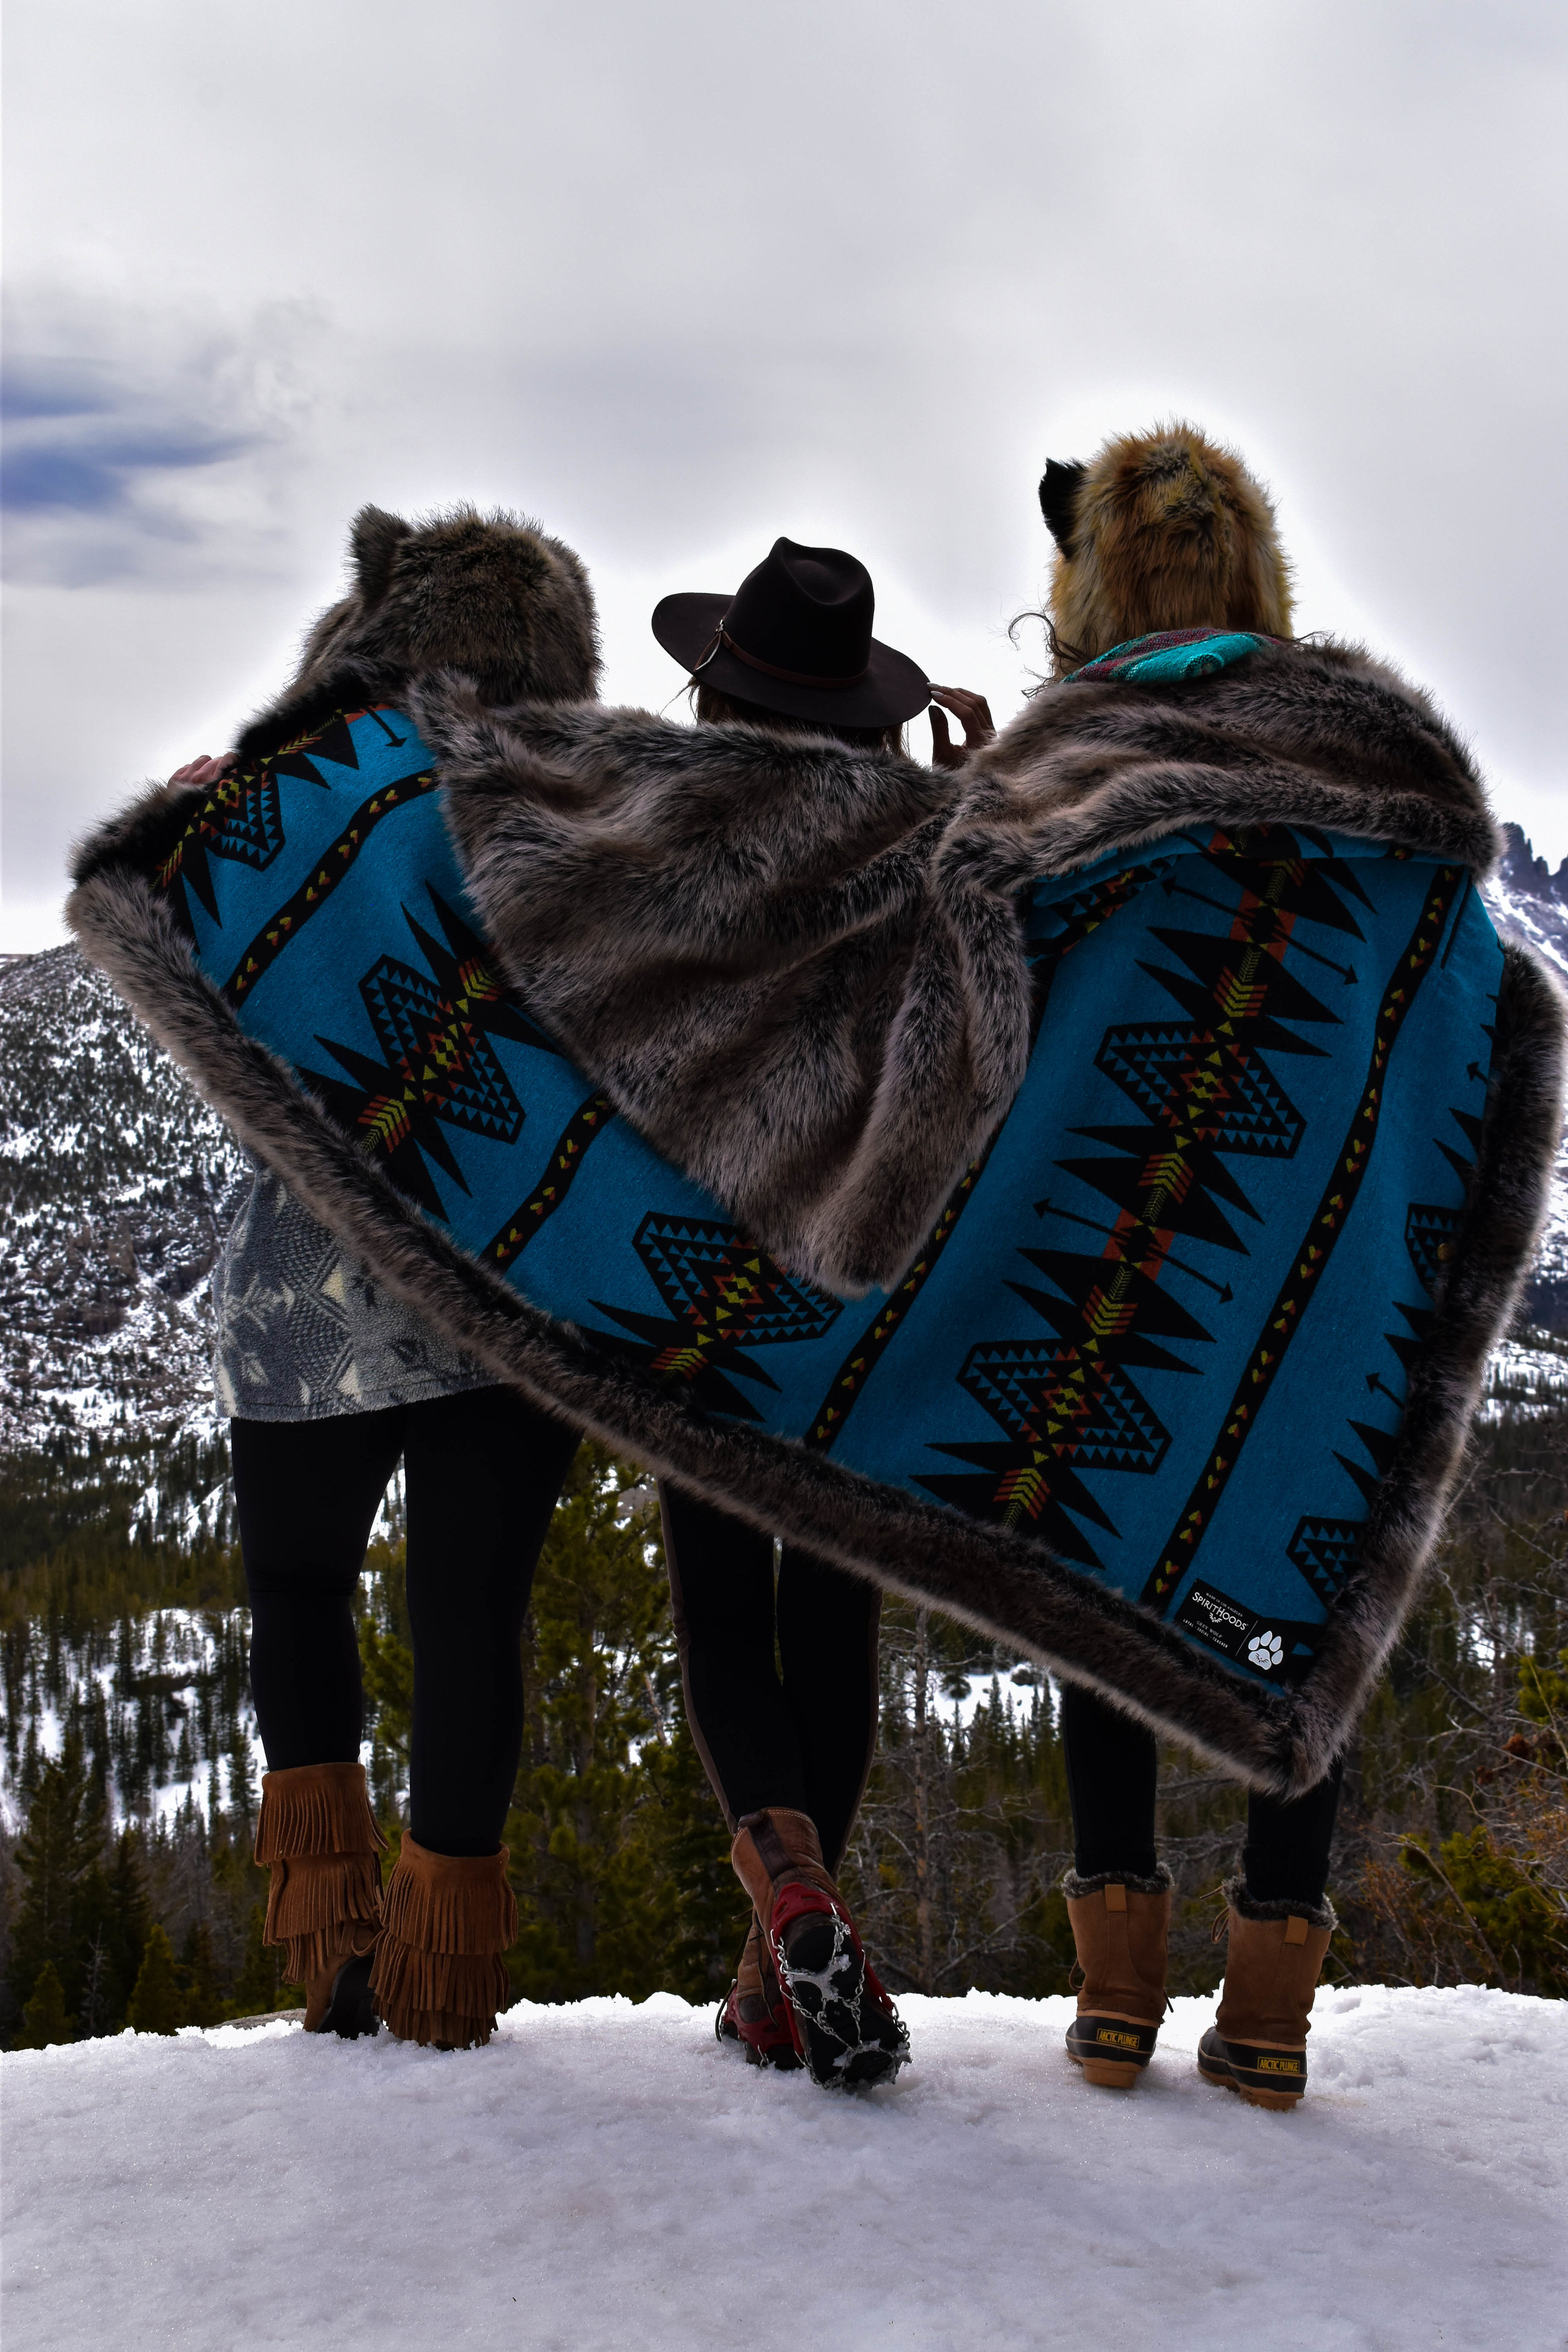 Estes Park with Spirit Hoods